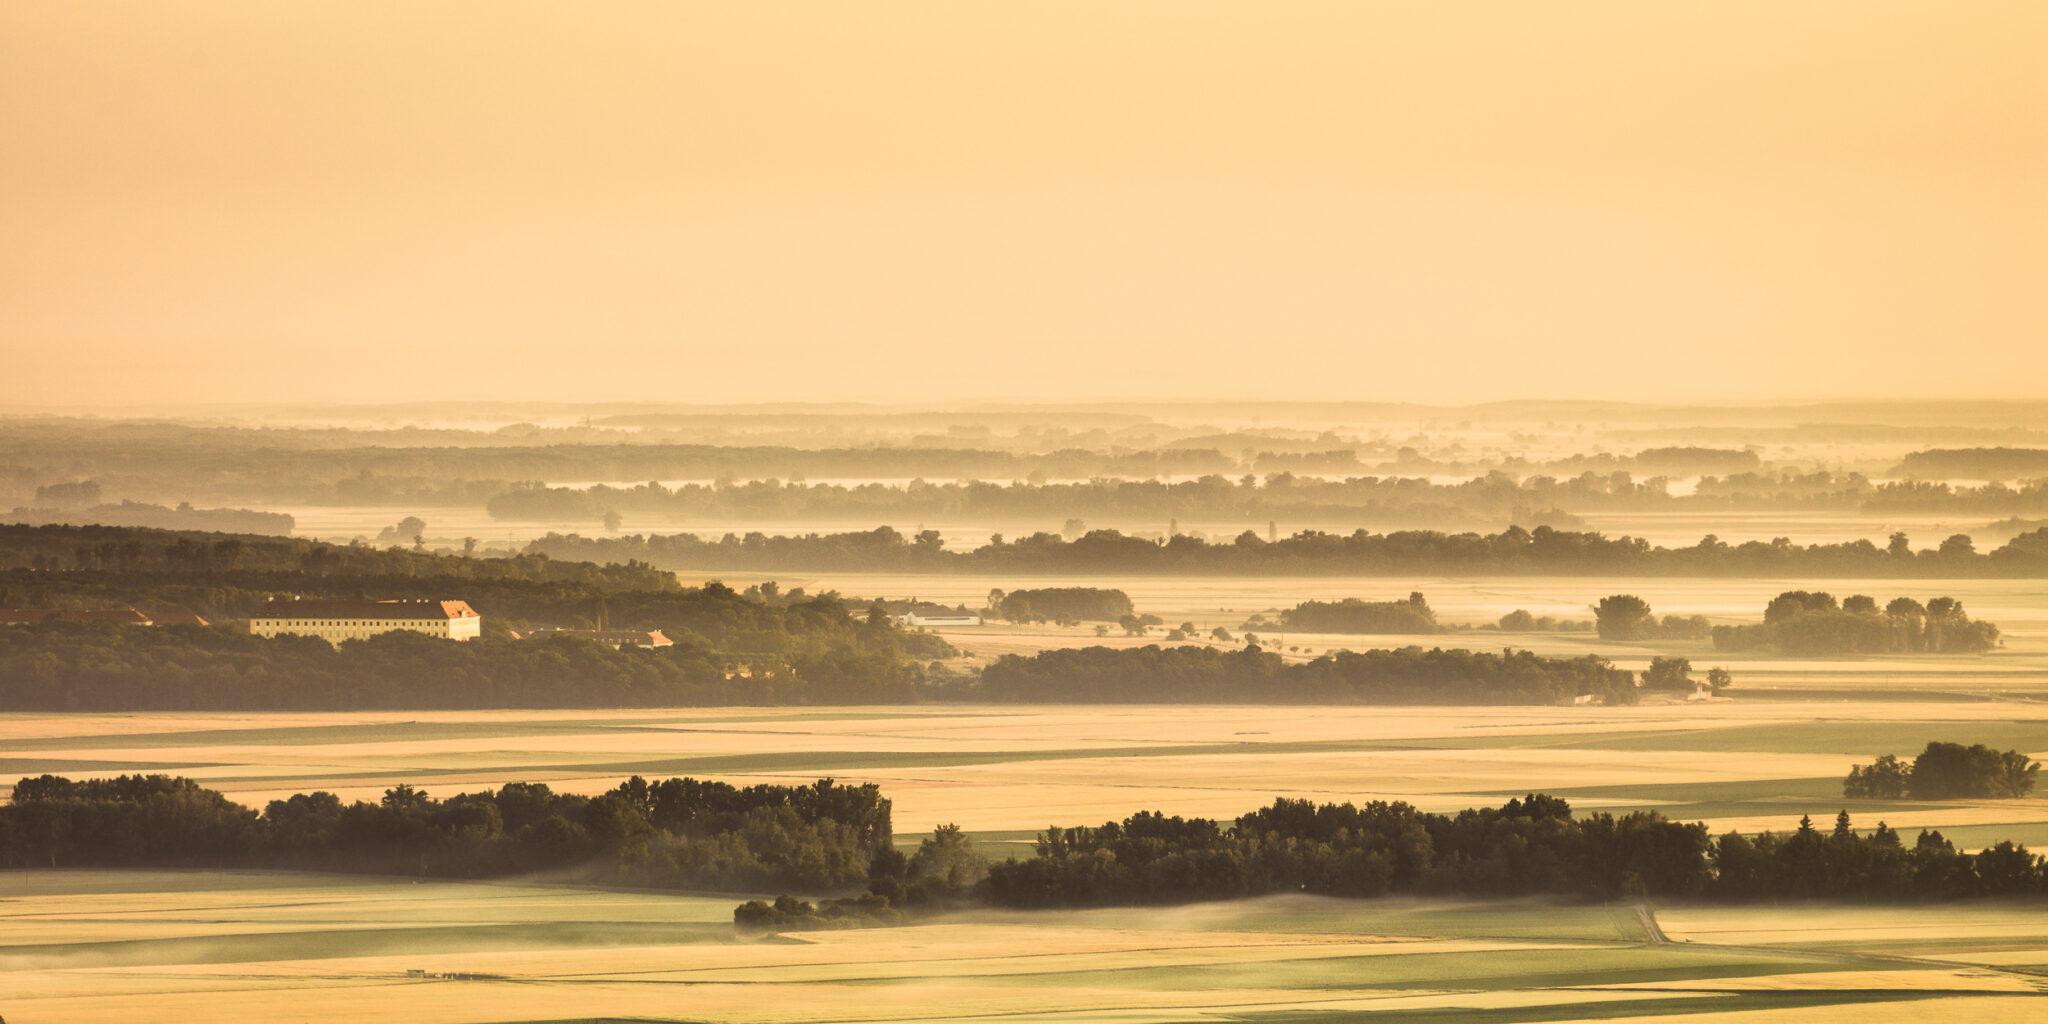 peter podpera landscape photography marchfeld schlosshof morgenstimmung a 01204 alt 300ppi 150x75cm